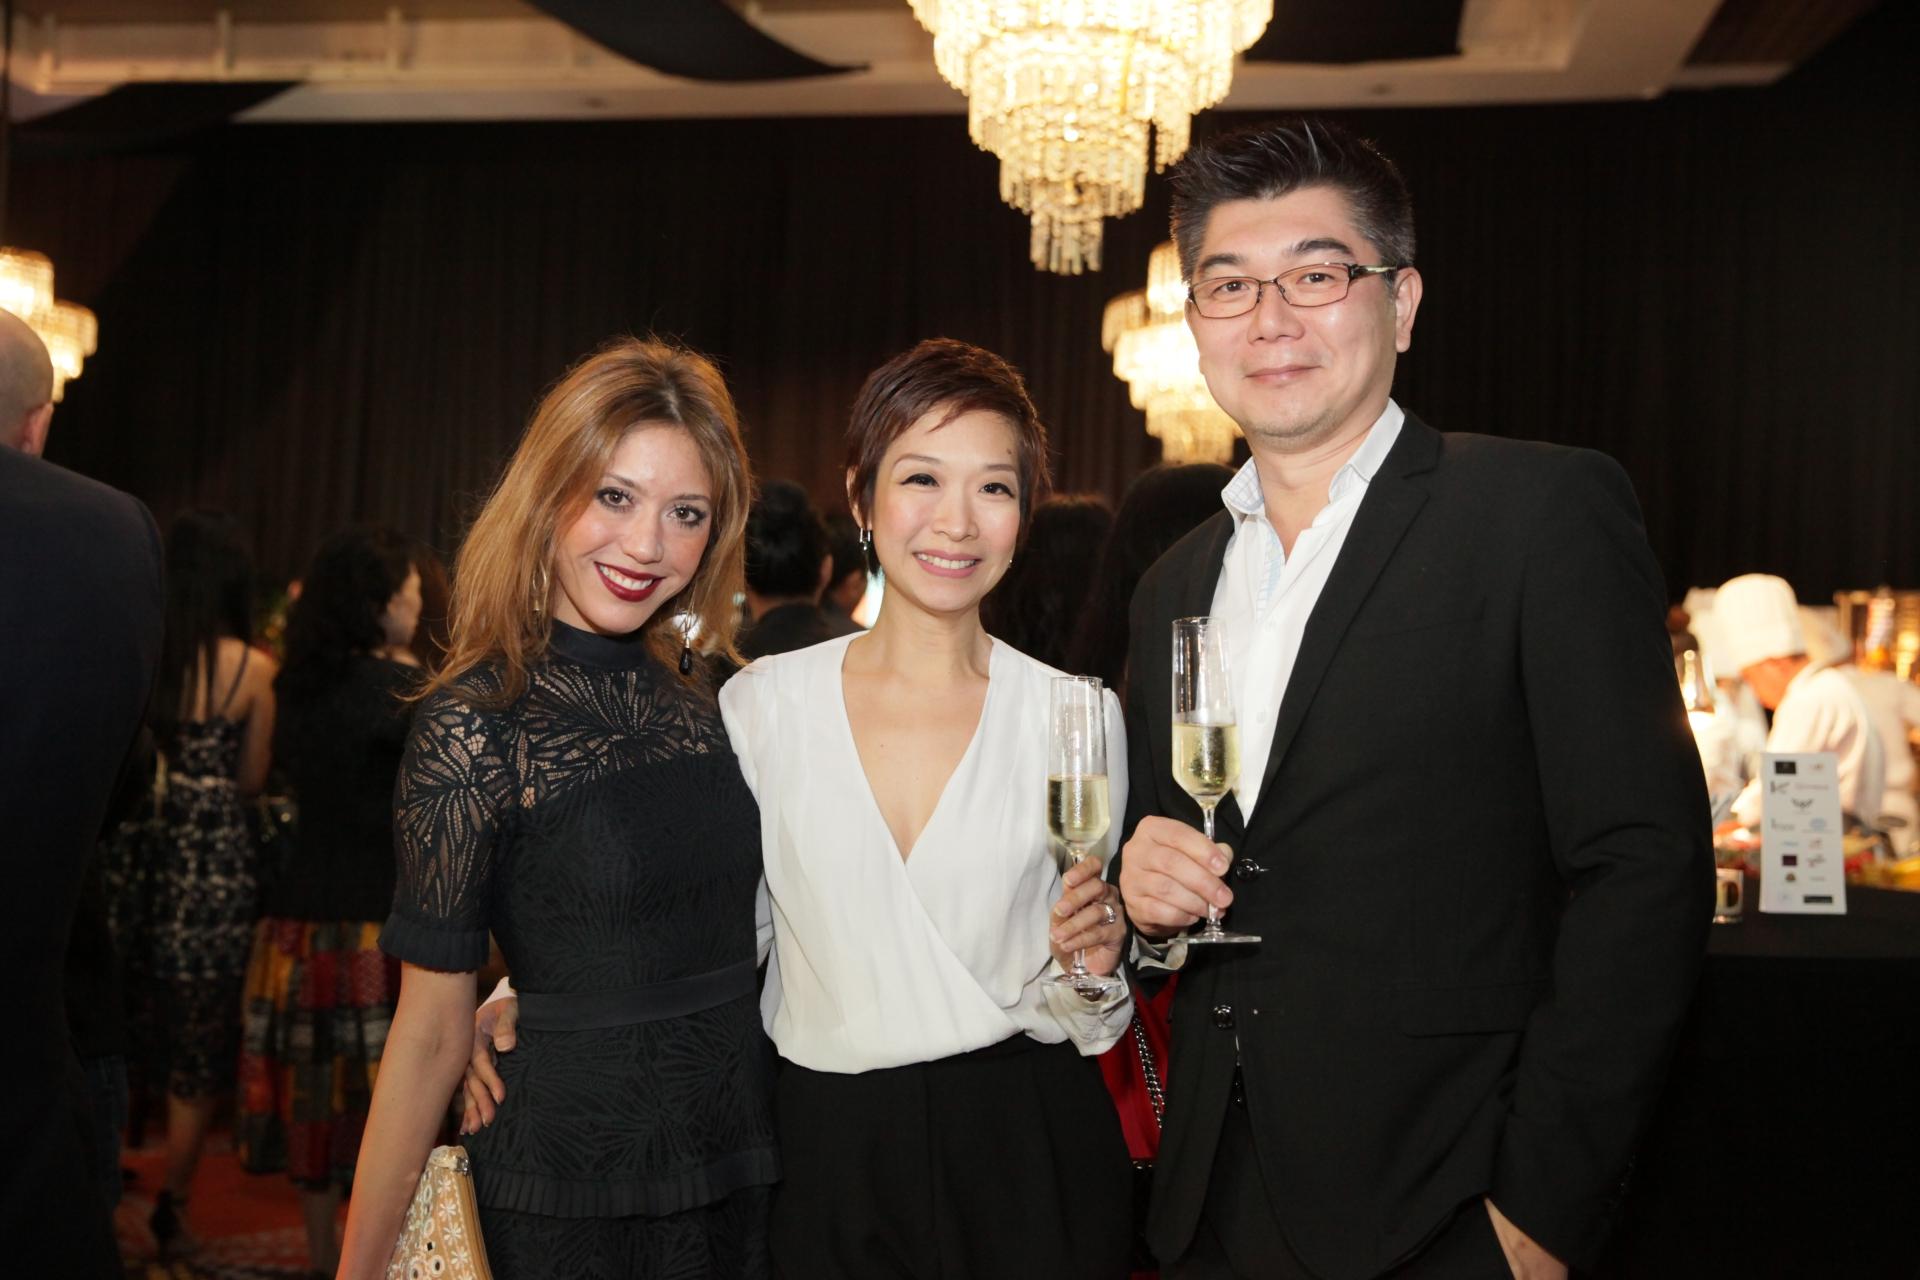 Shauna Jay Popple Williams and Charmaine and Eric Wang